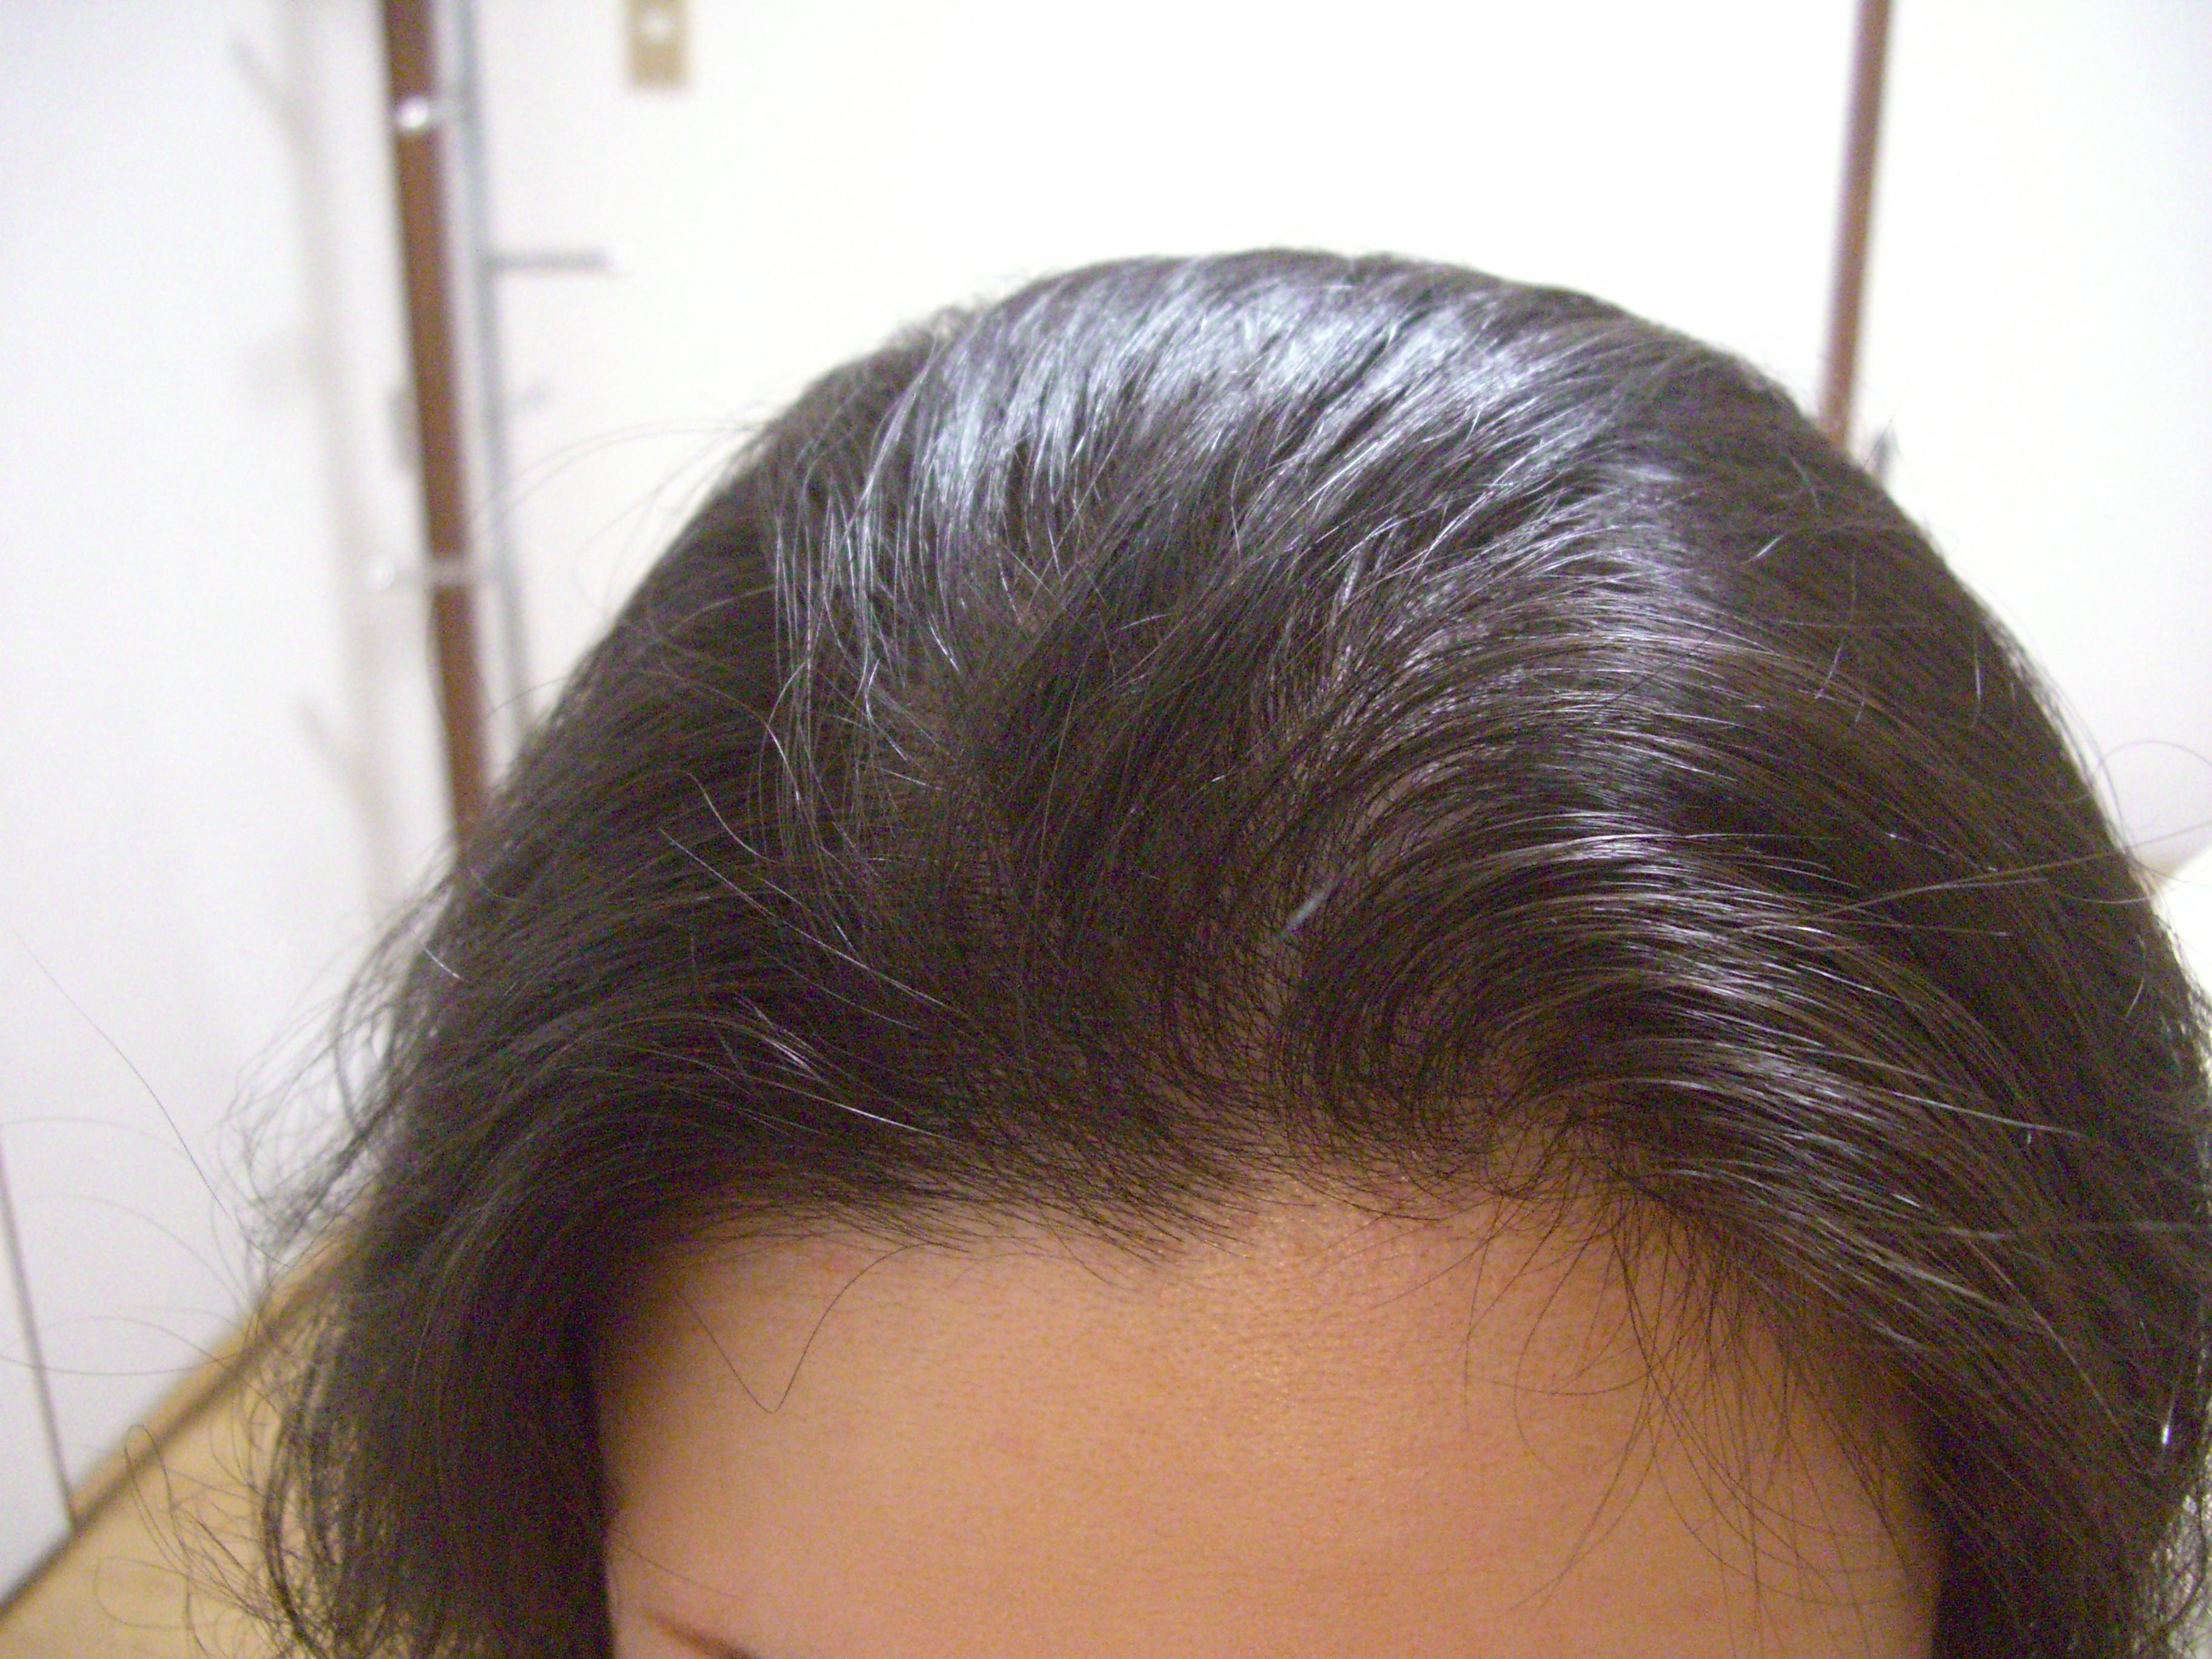 Bさんのケア後の毛と頭皮